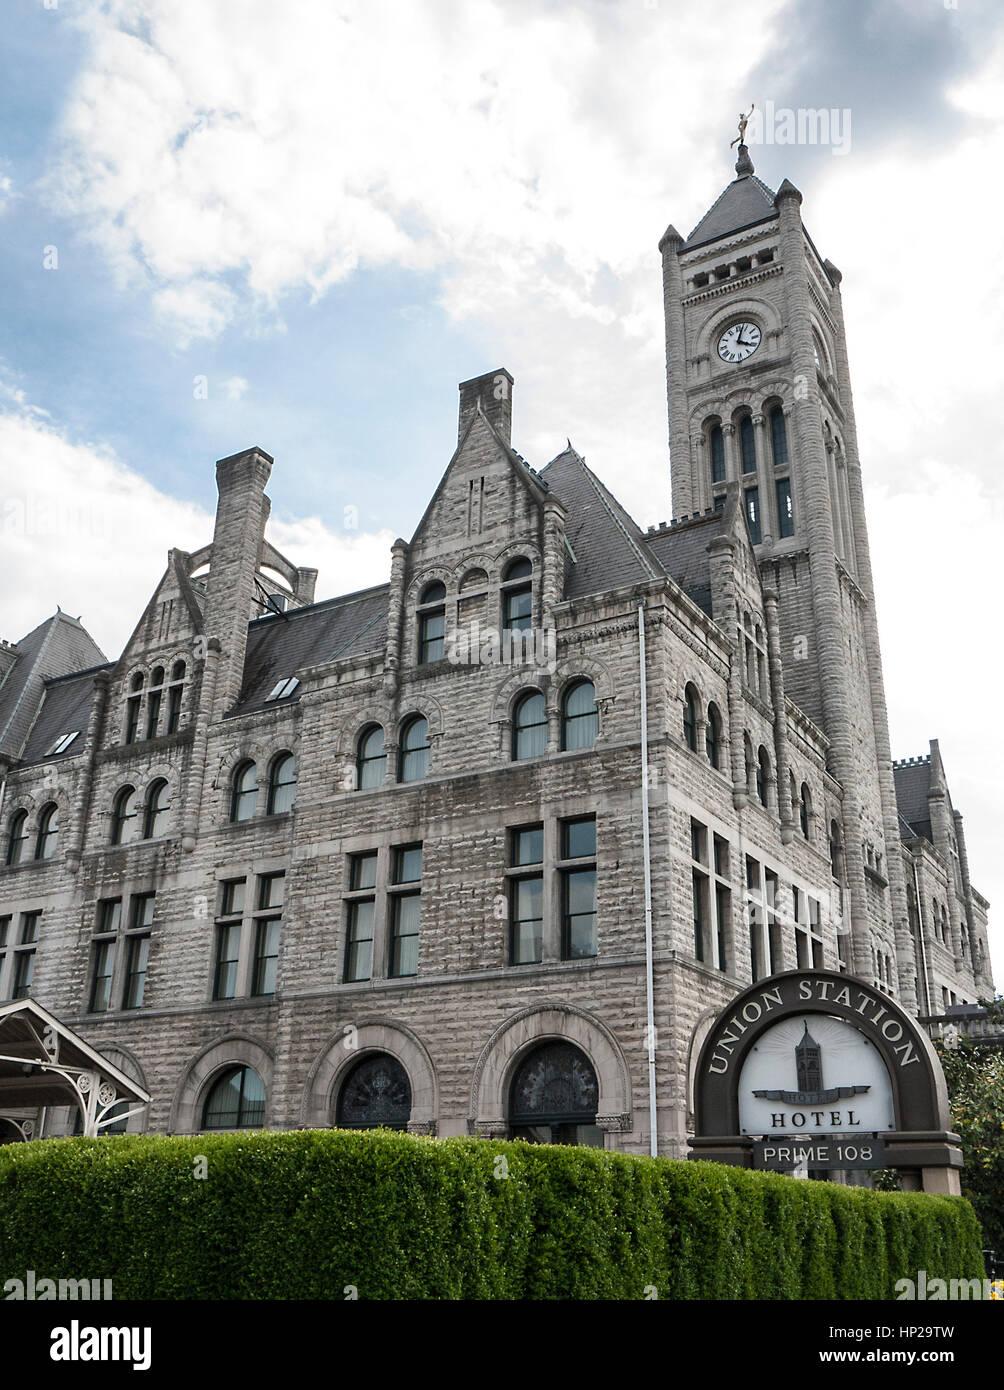 Historic Union Station Hotel, Nashville, Tennessee - Stock Image